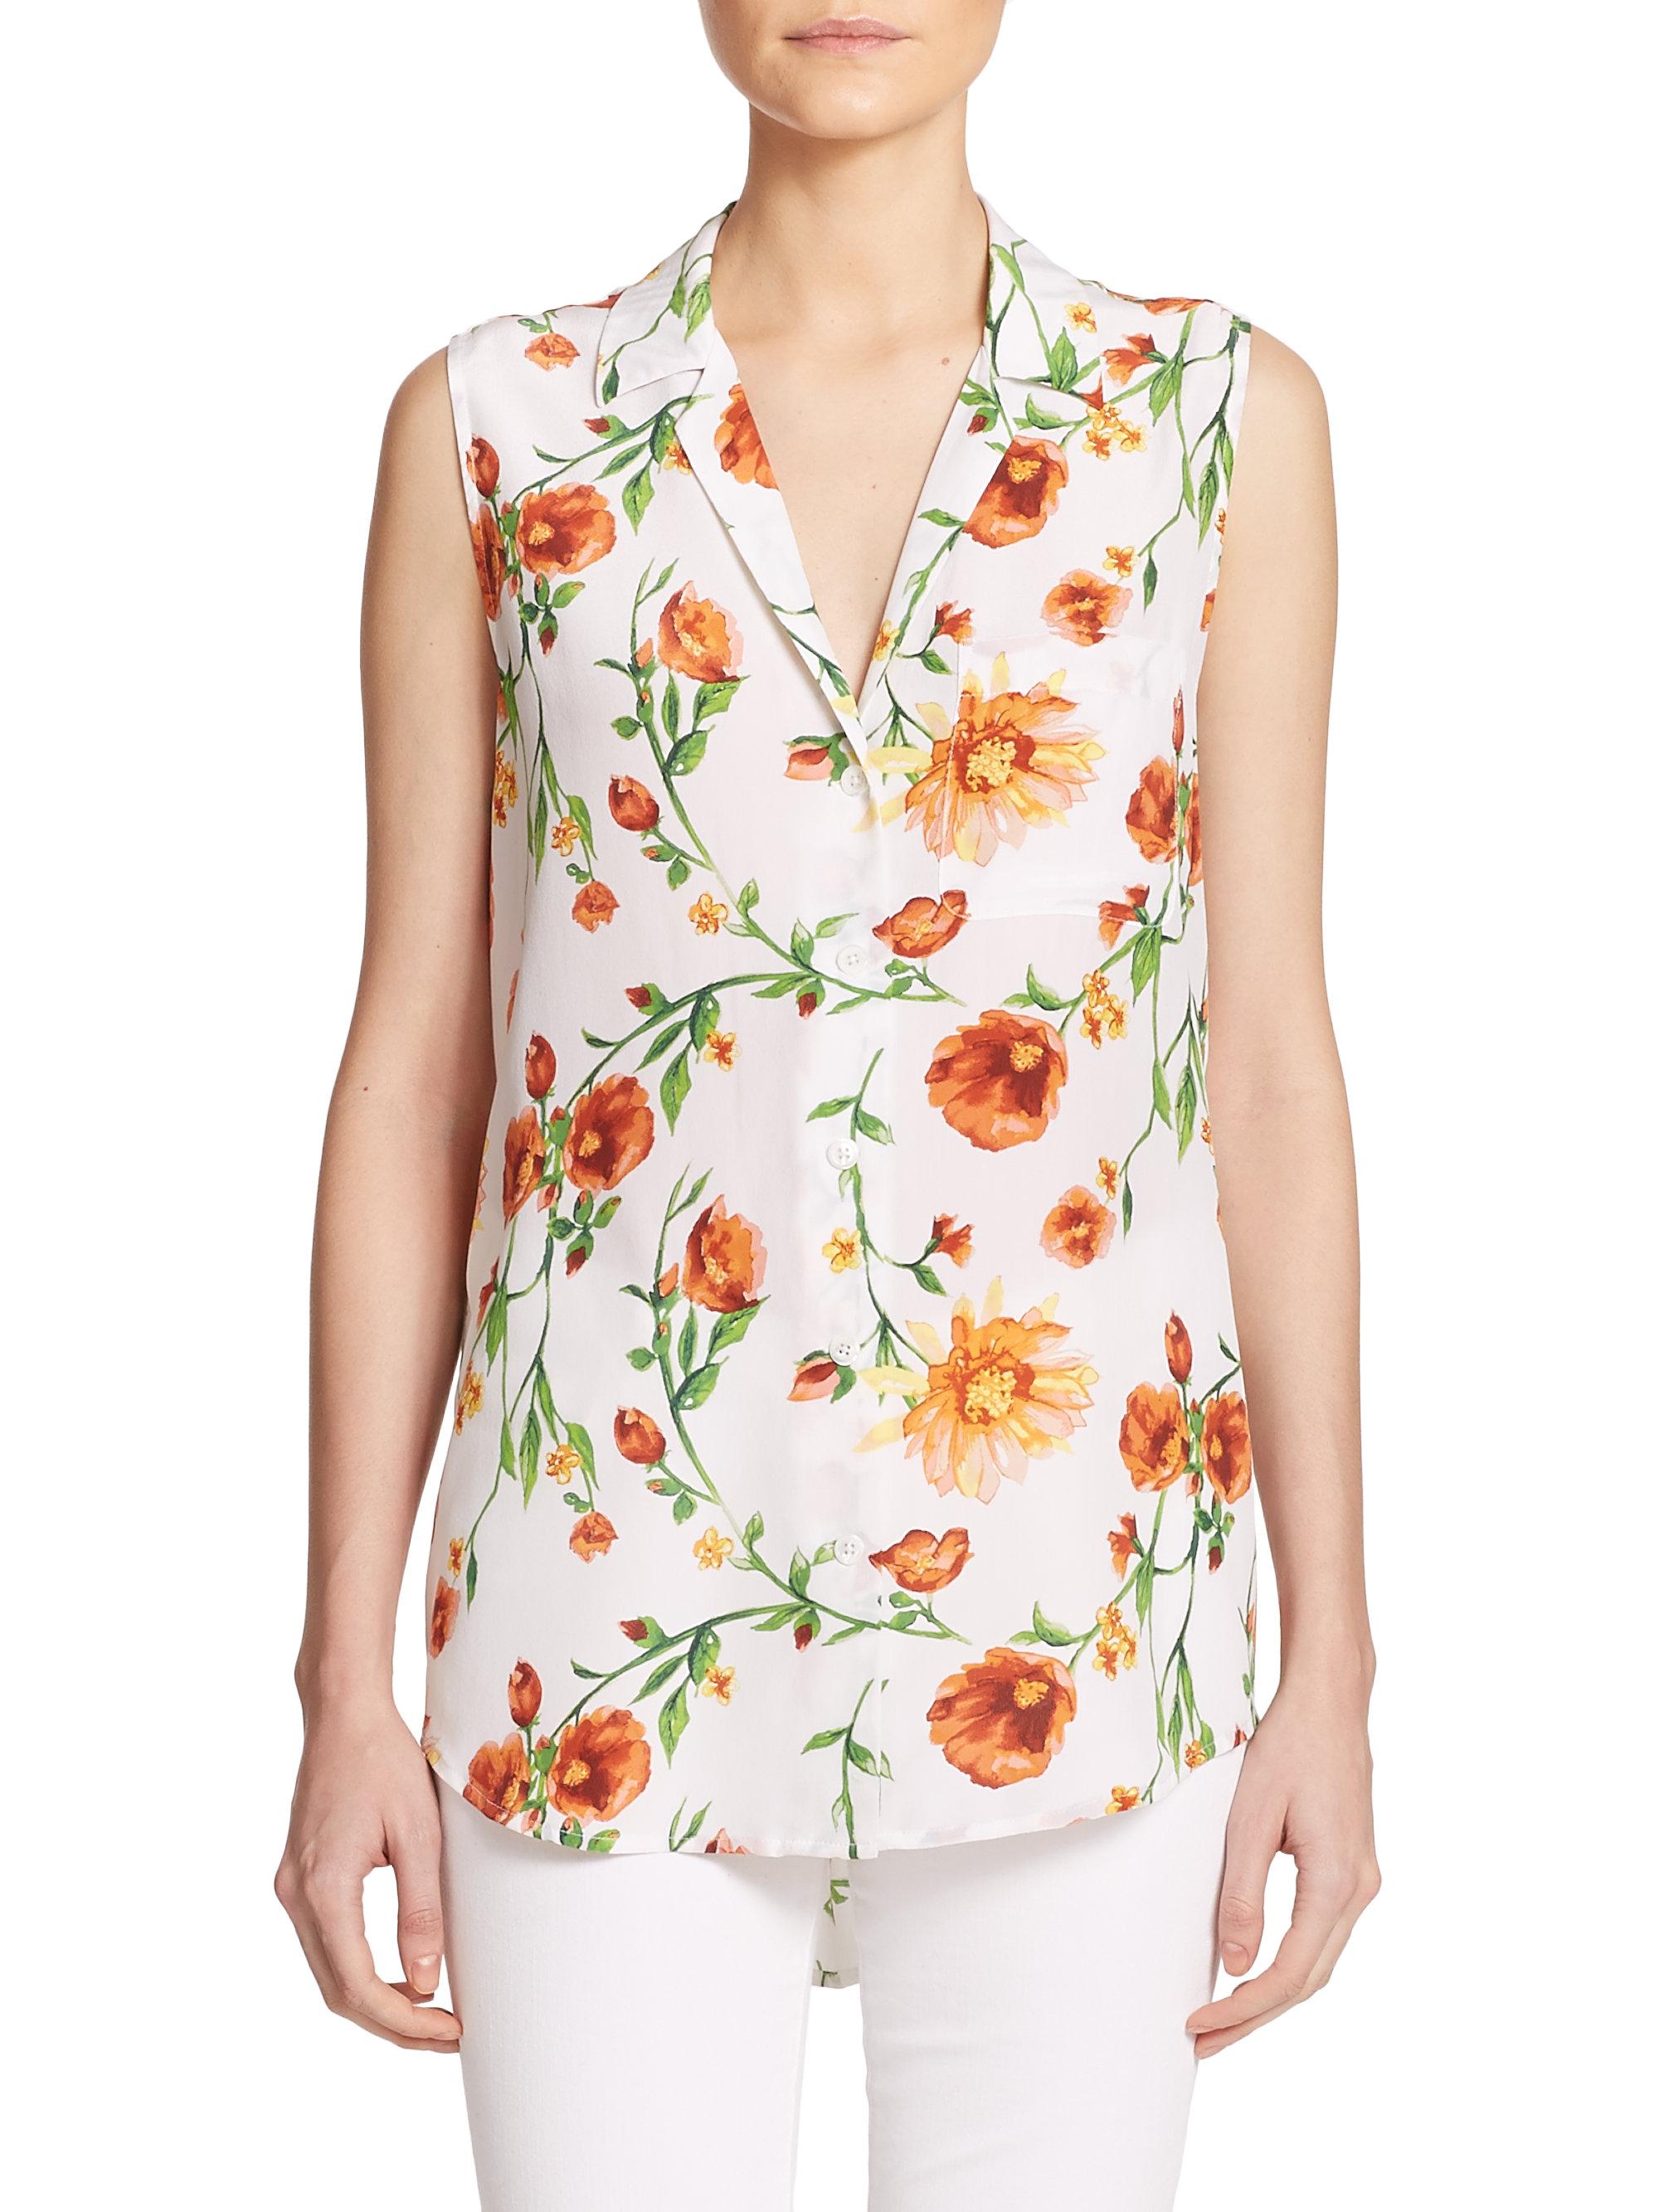 872b27da6aff6 Lyst - Equipment Keira Floral-print Silk Sleeveless Blouse